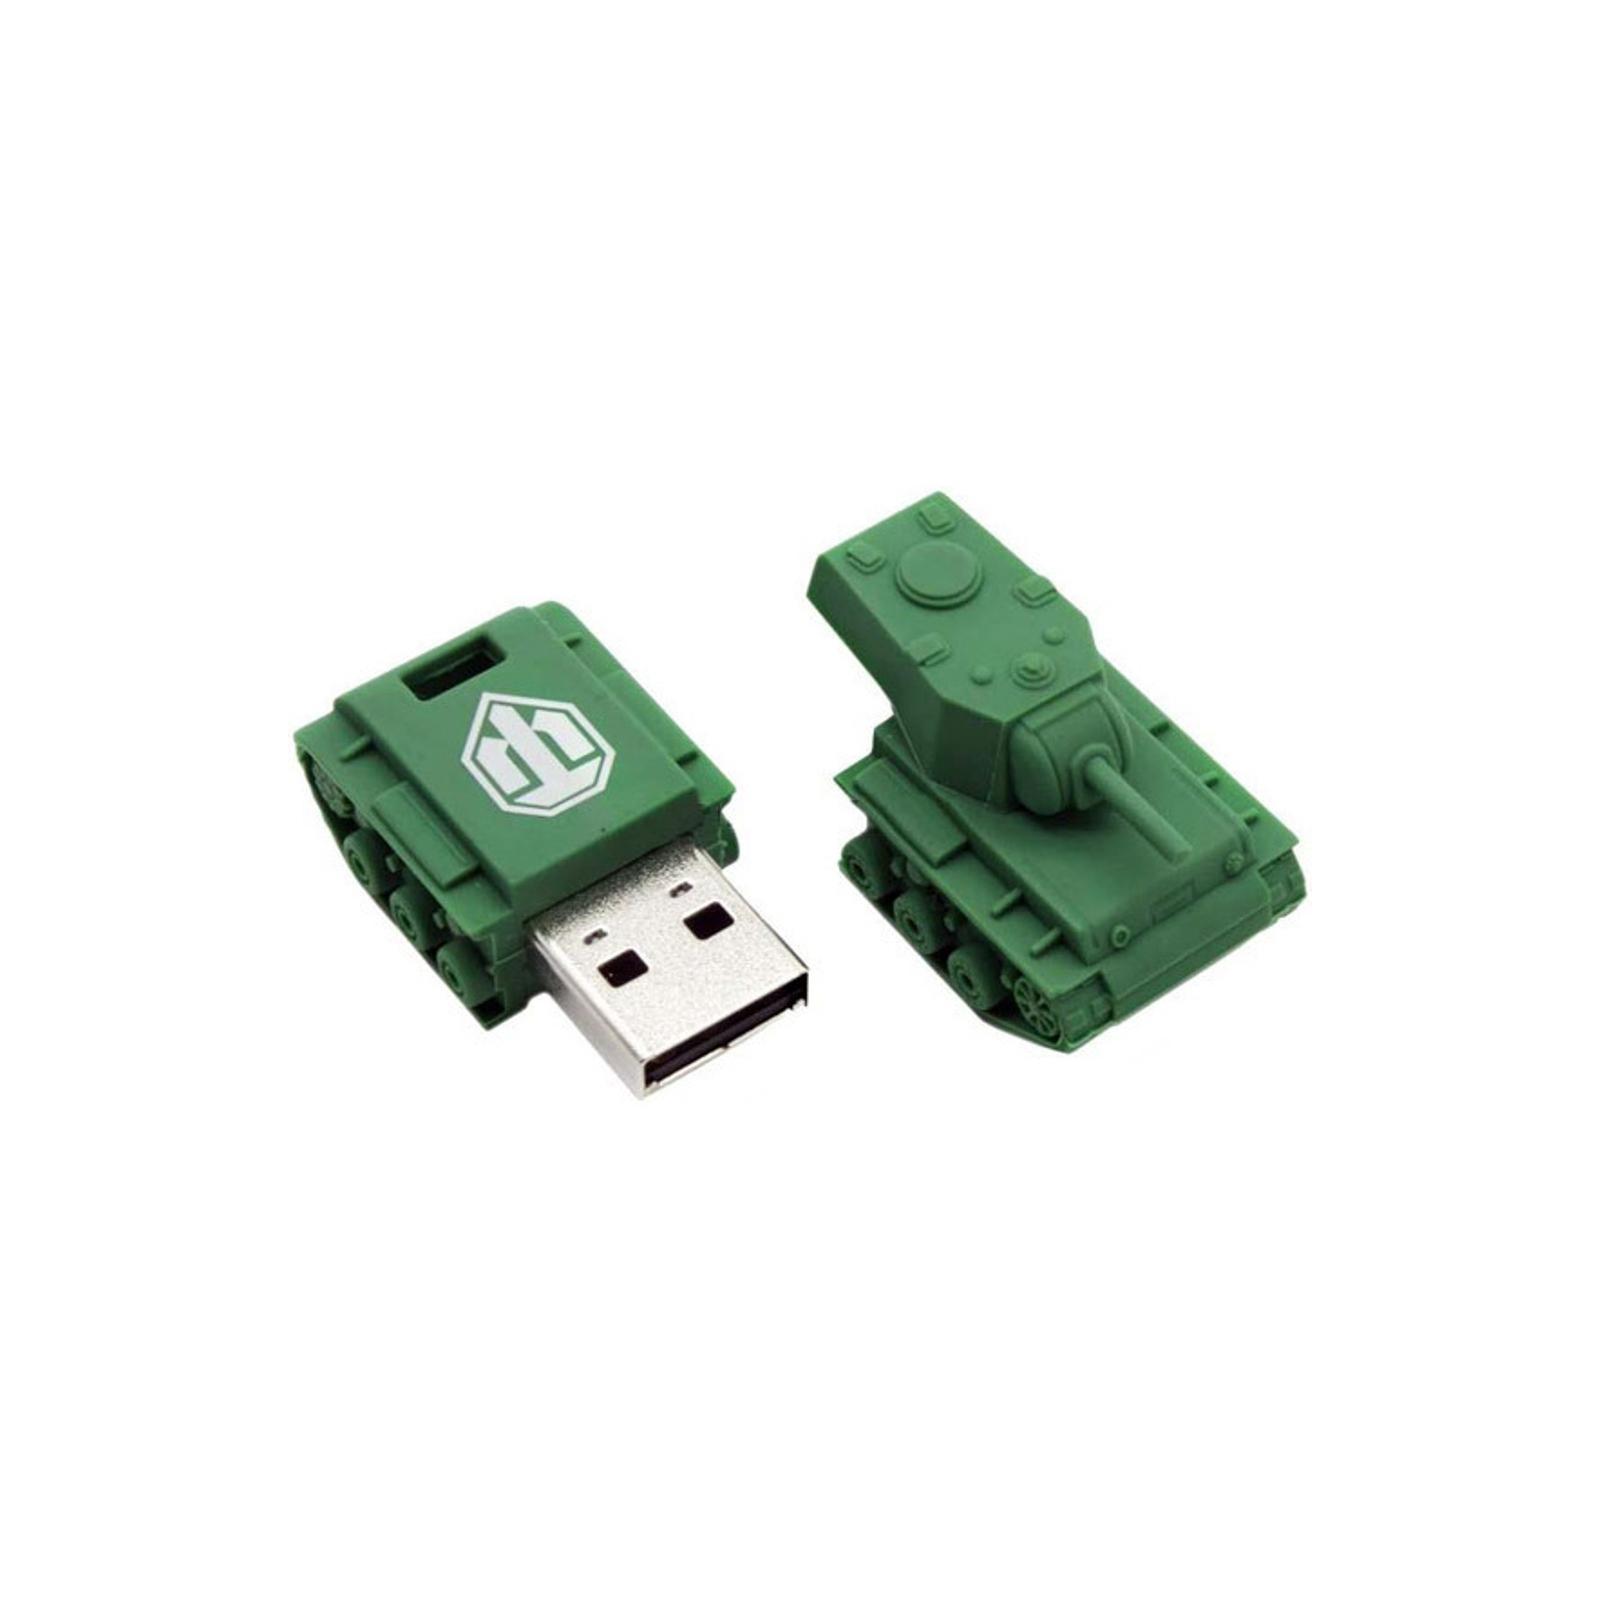 USB флеш накопитель Kingston 16 GB Custom Rubber Tank (DT-TANK/16GB) изображение 3